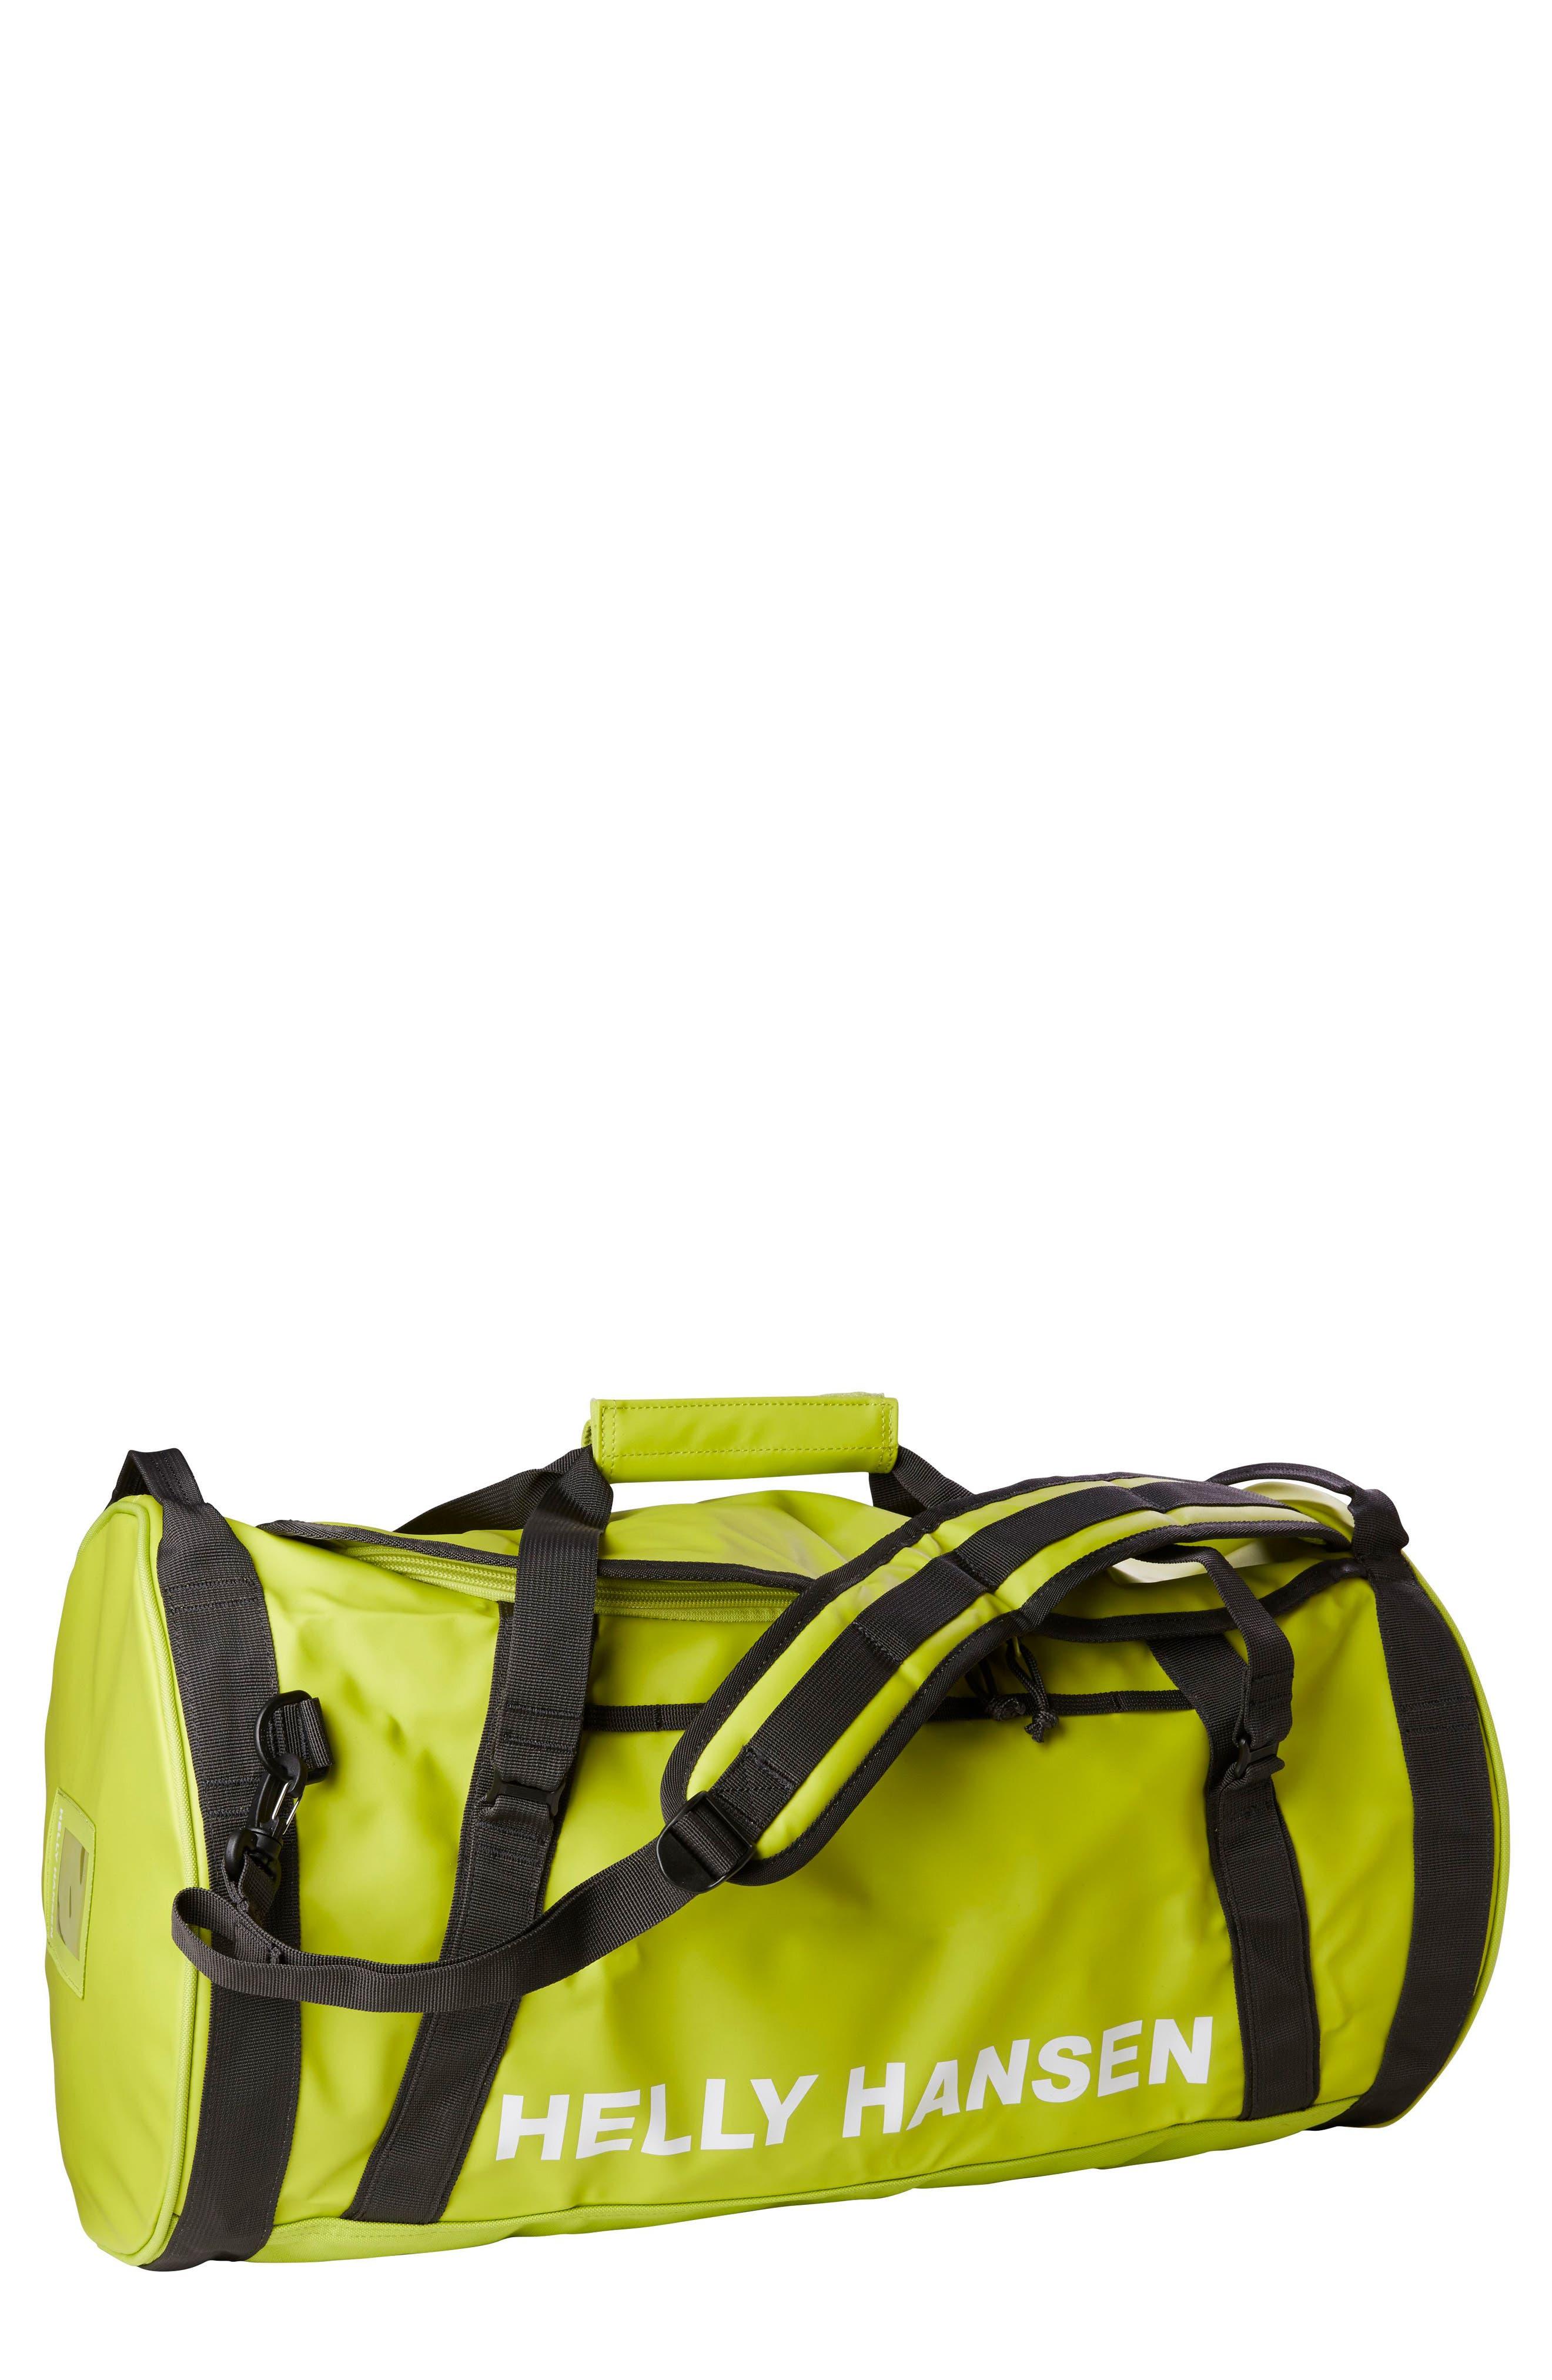 HELLY HANSEN,                             50-Liter Duffel Bag,                             Main thumbnail 1, color,                             009